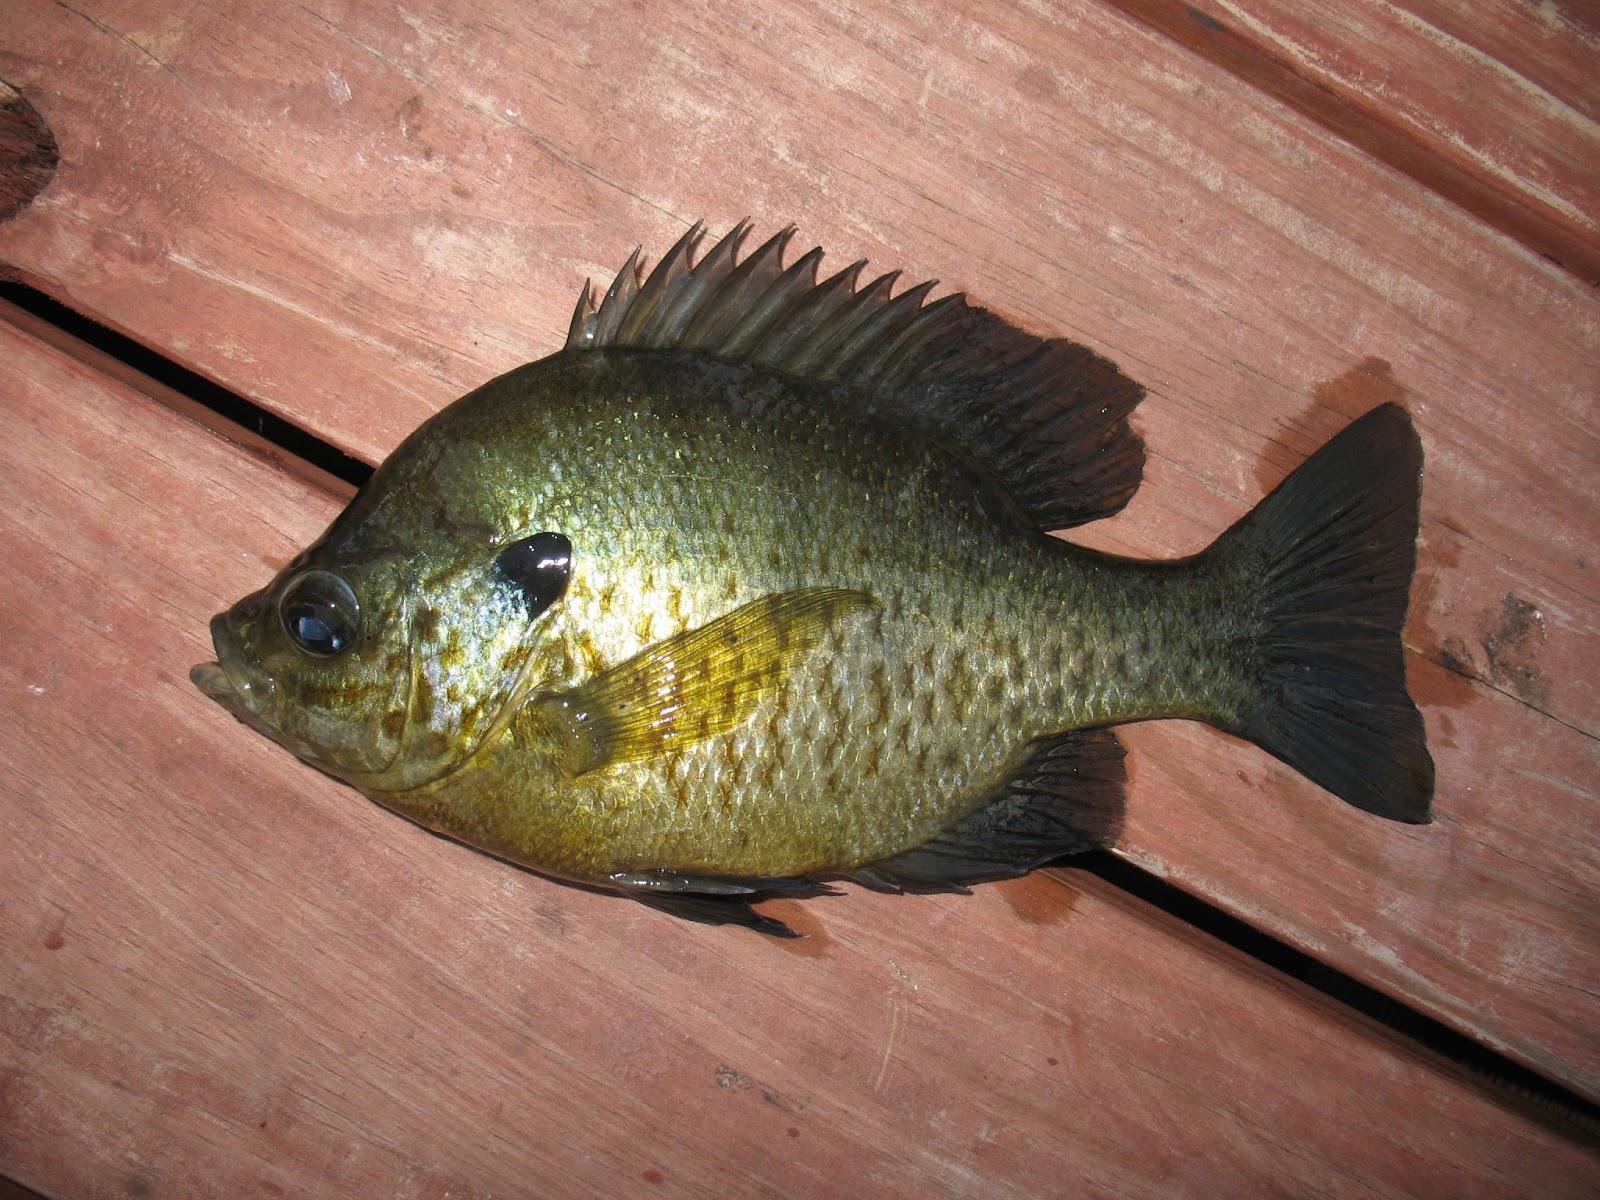 Redear Sunfish (Lepomis microlophus) - new species #2